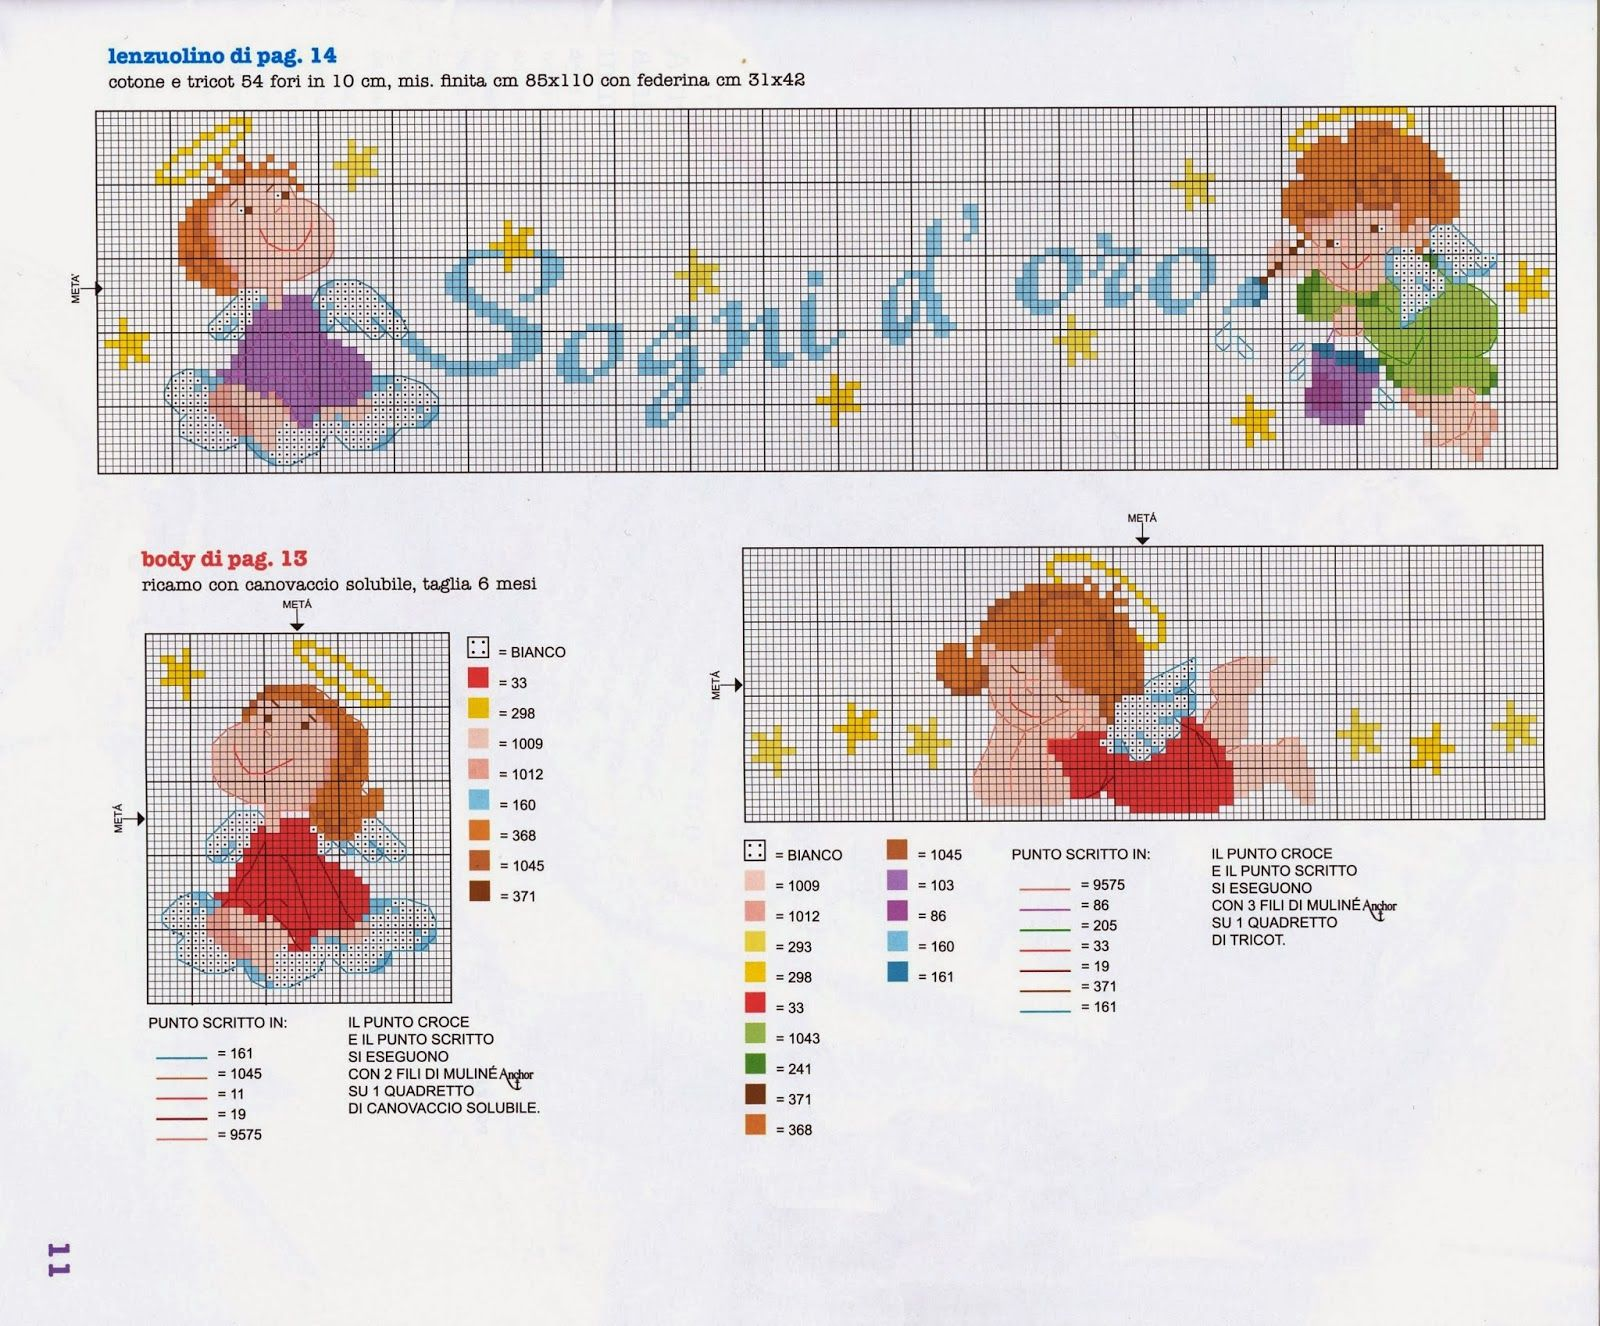 Ricami e schemi a punto croce gratuiti tanti schemi punto for Ricami a punto croce per neonati